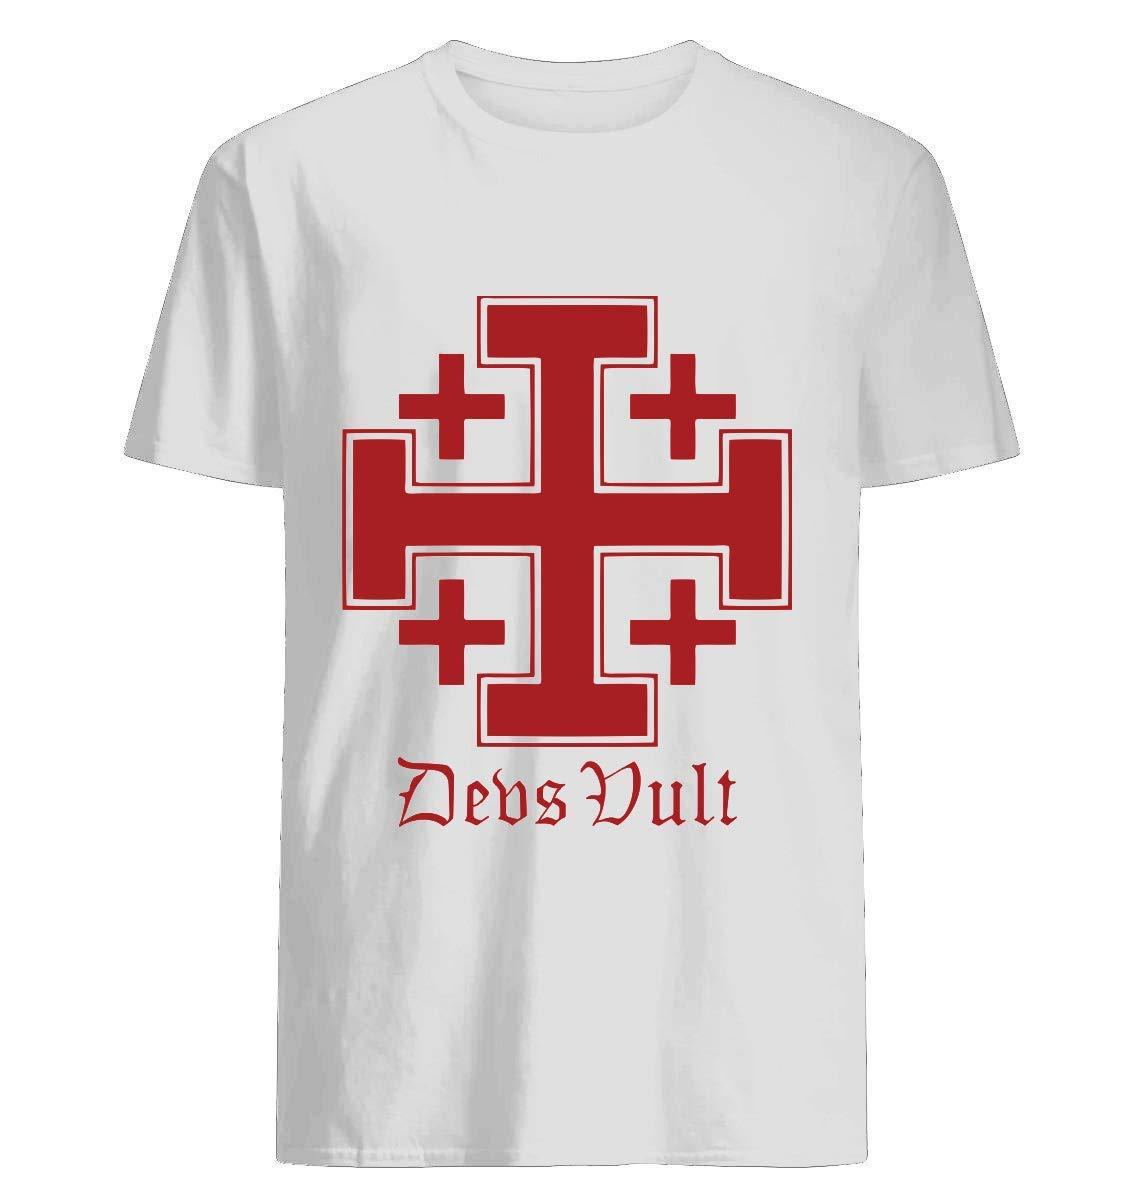 Deus Vult Cross Red Shirts